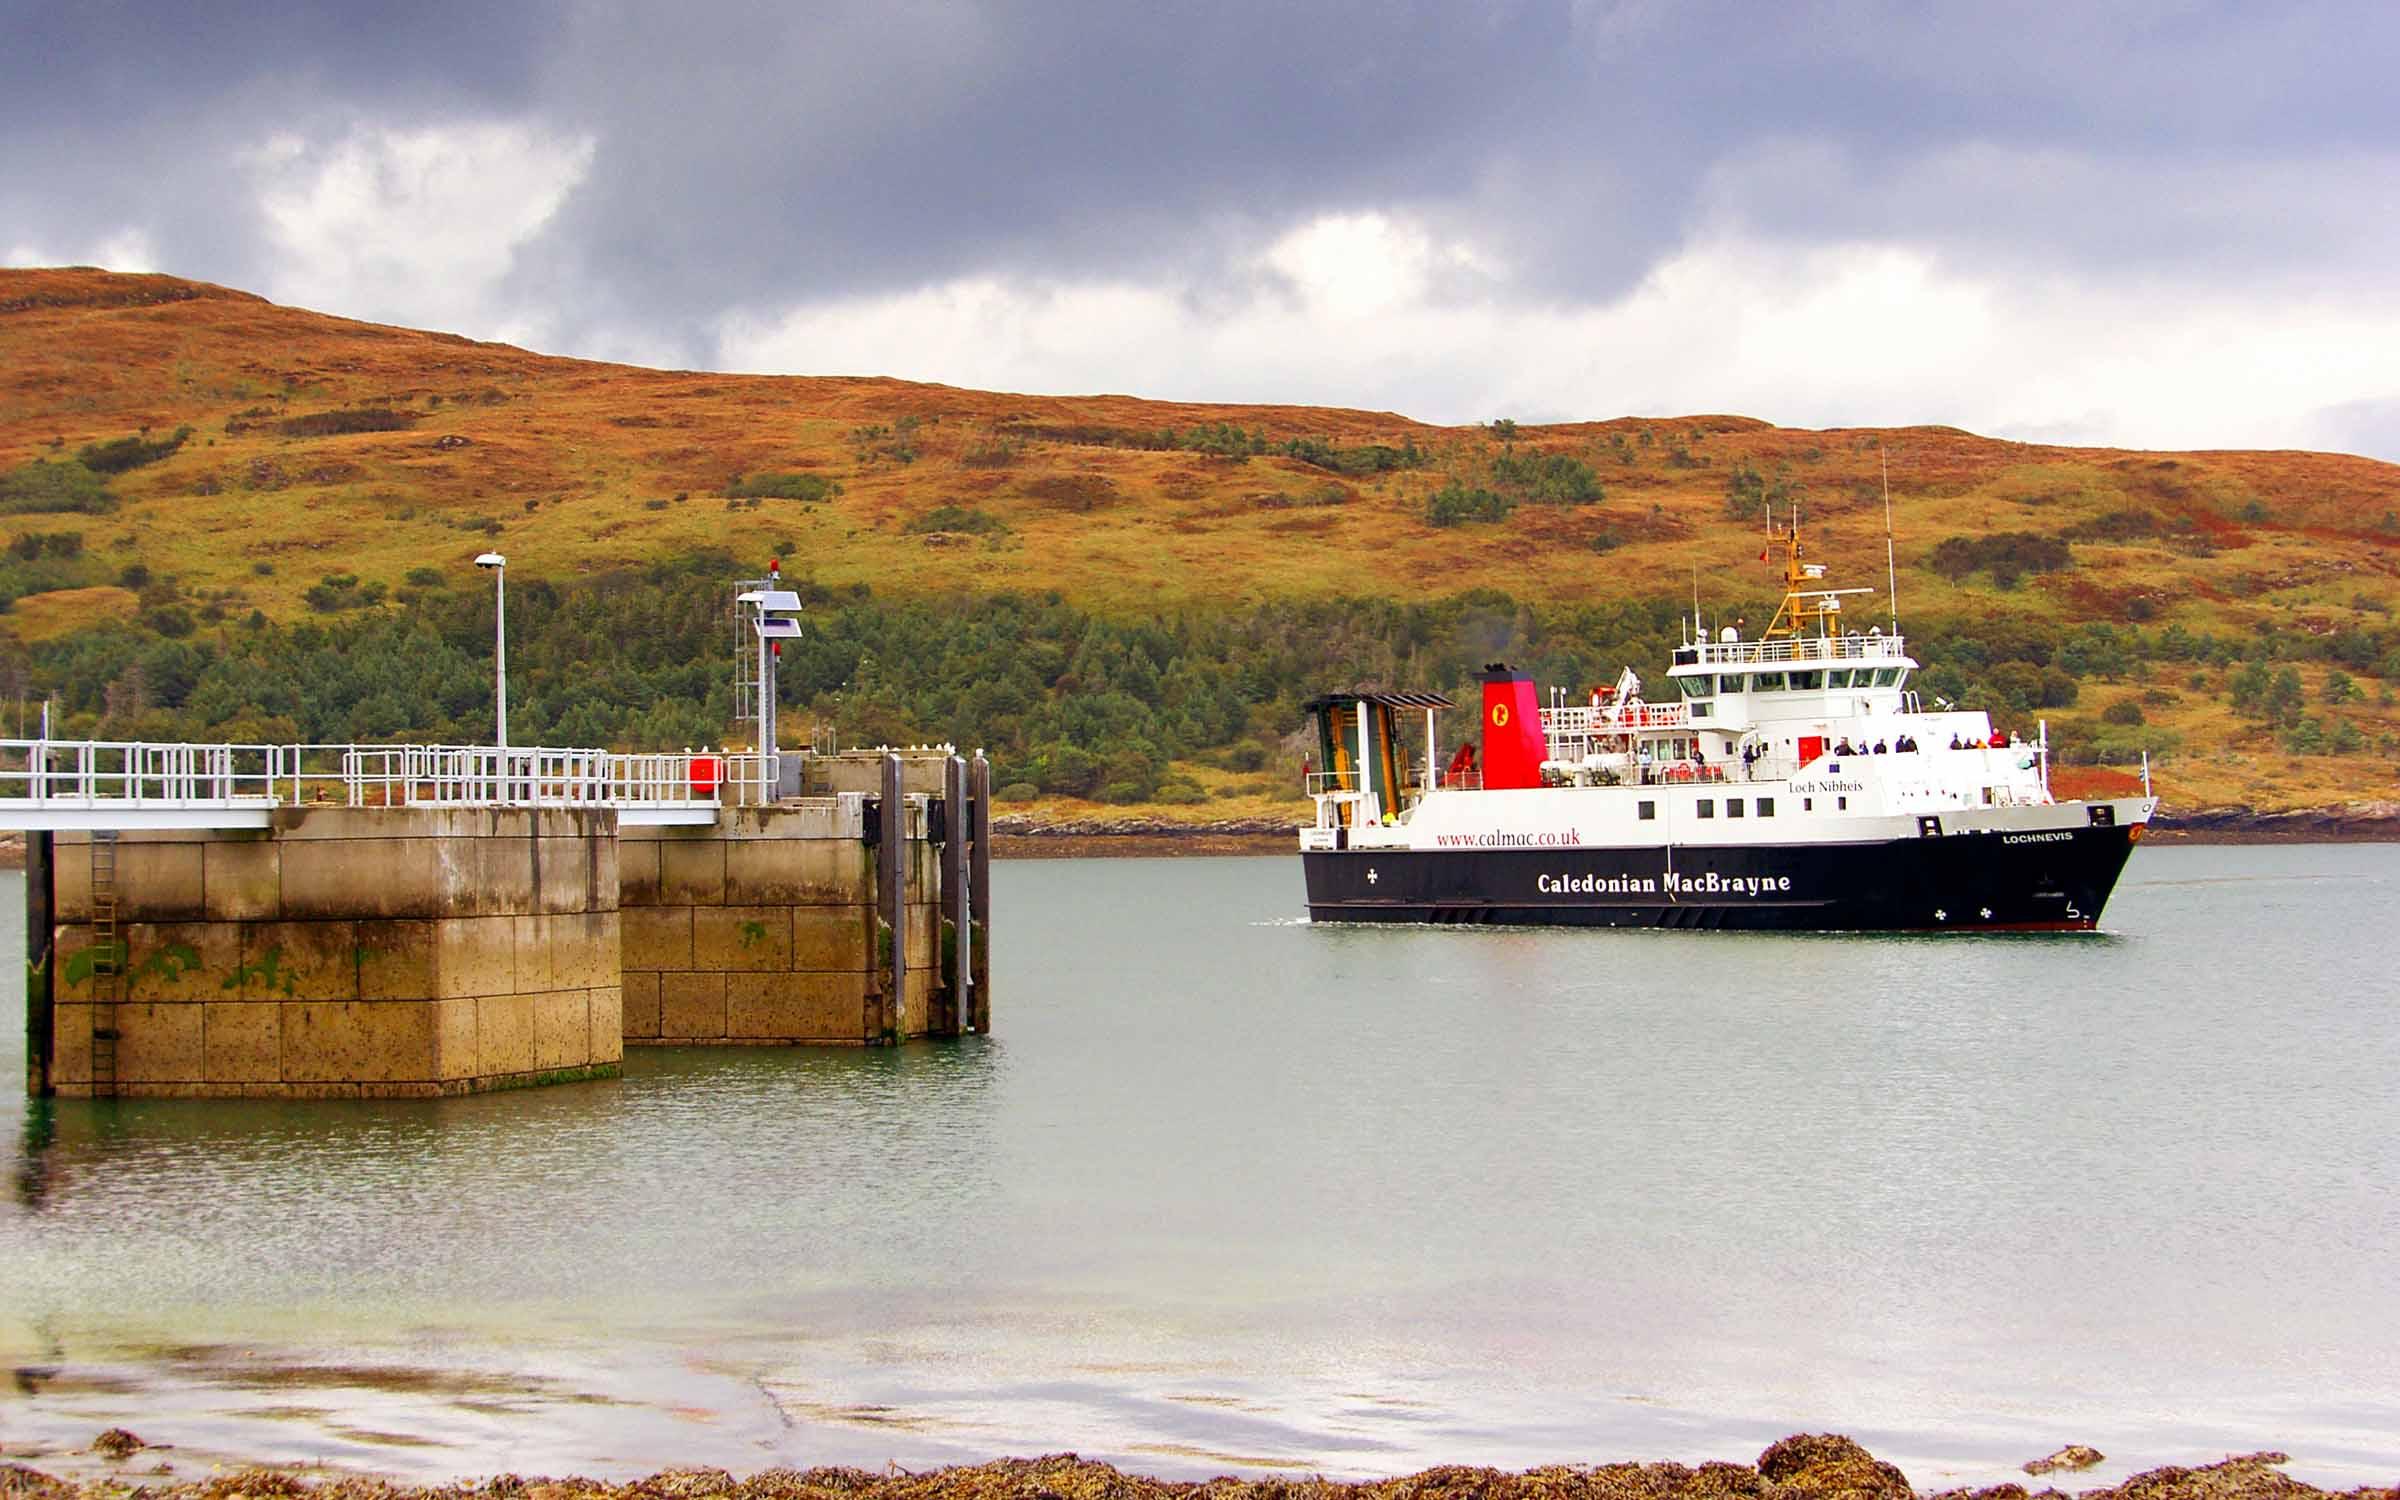 Lochnevis arriving at Rum (Ships of CalMac)